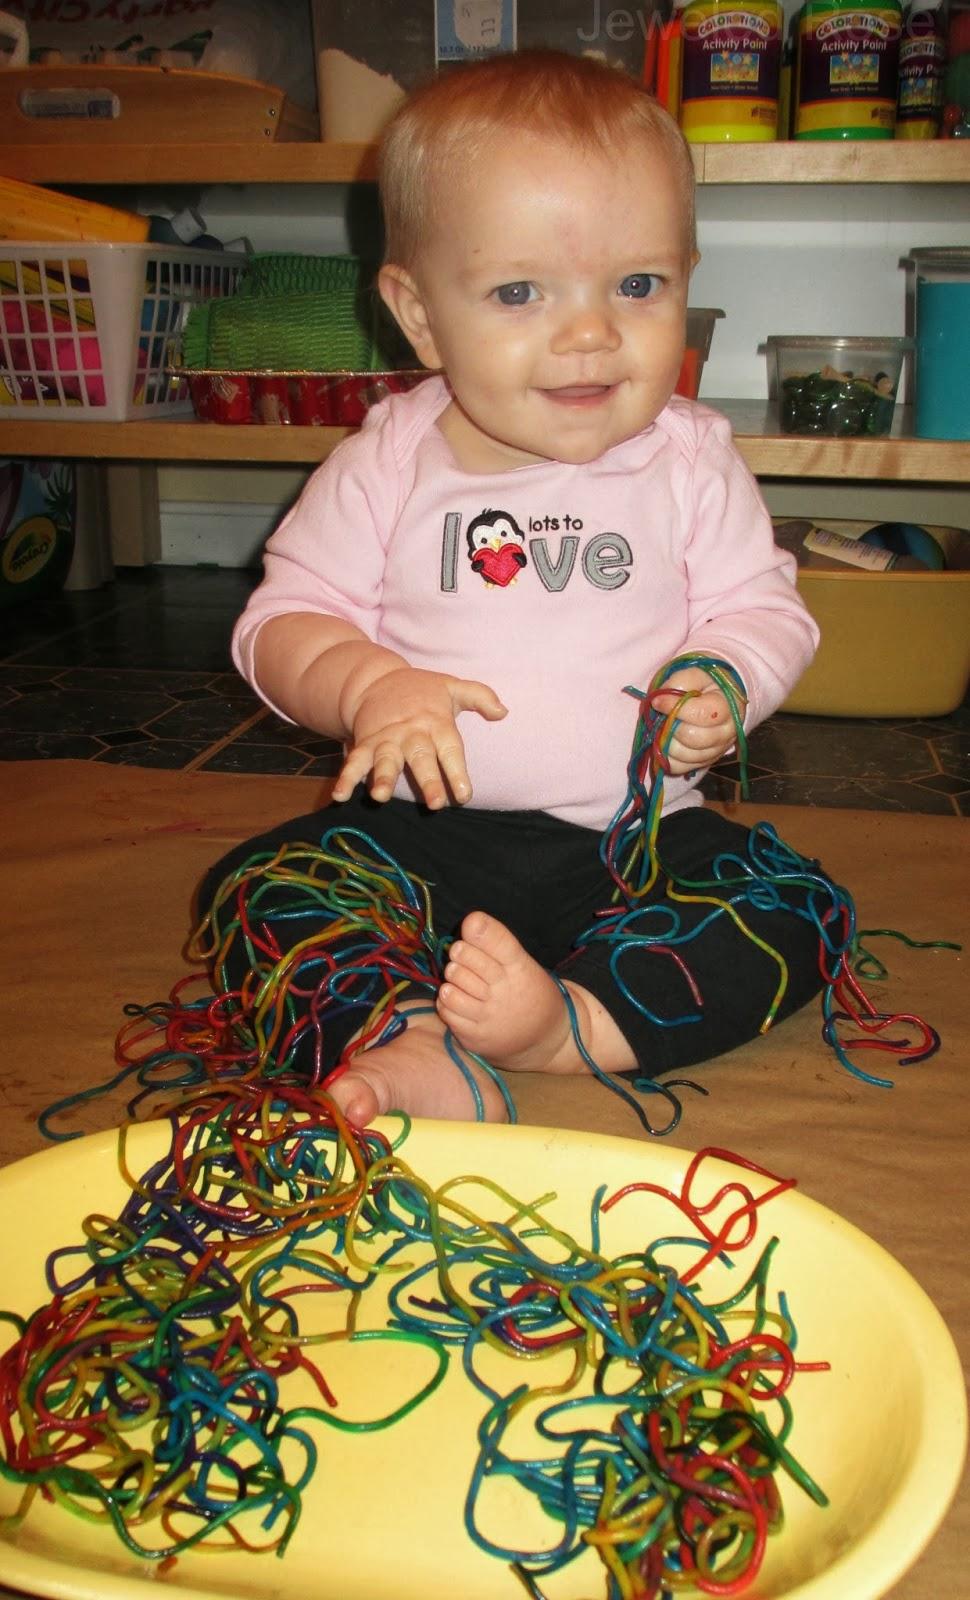 Sensory Play for Baby